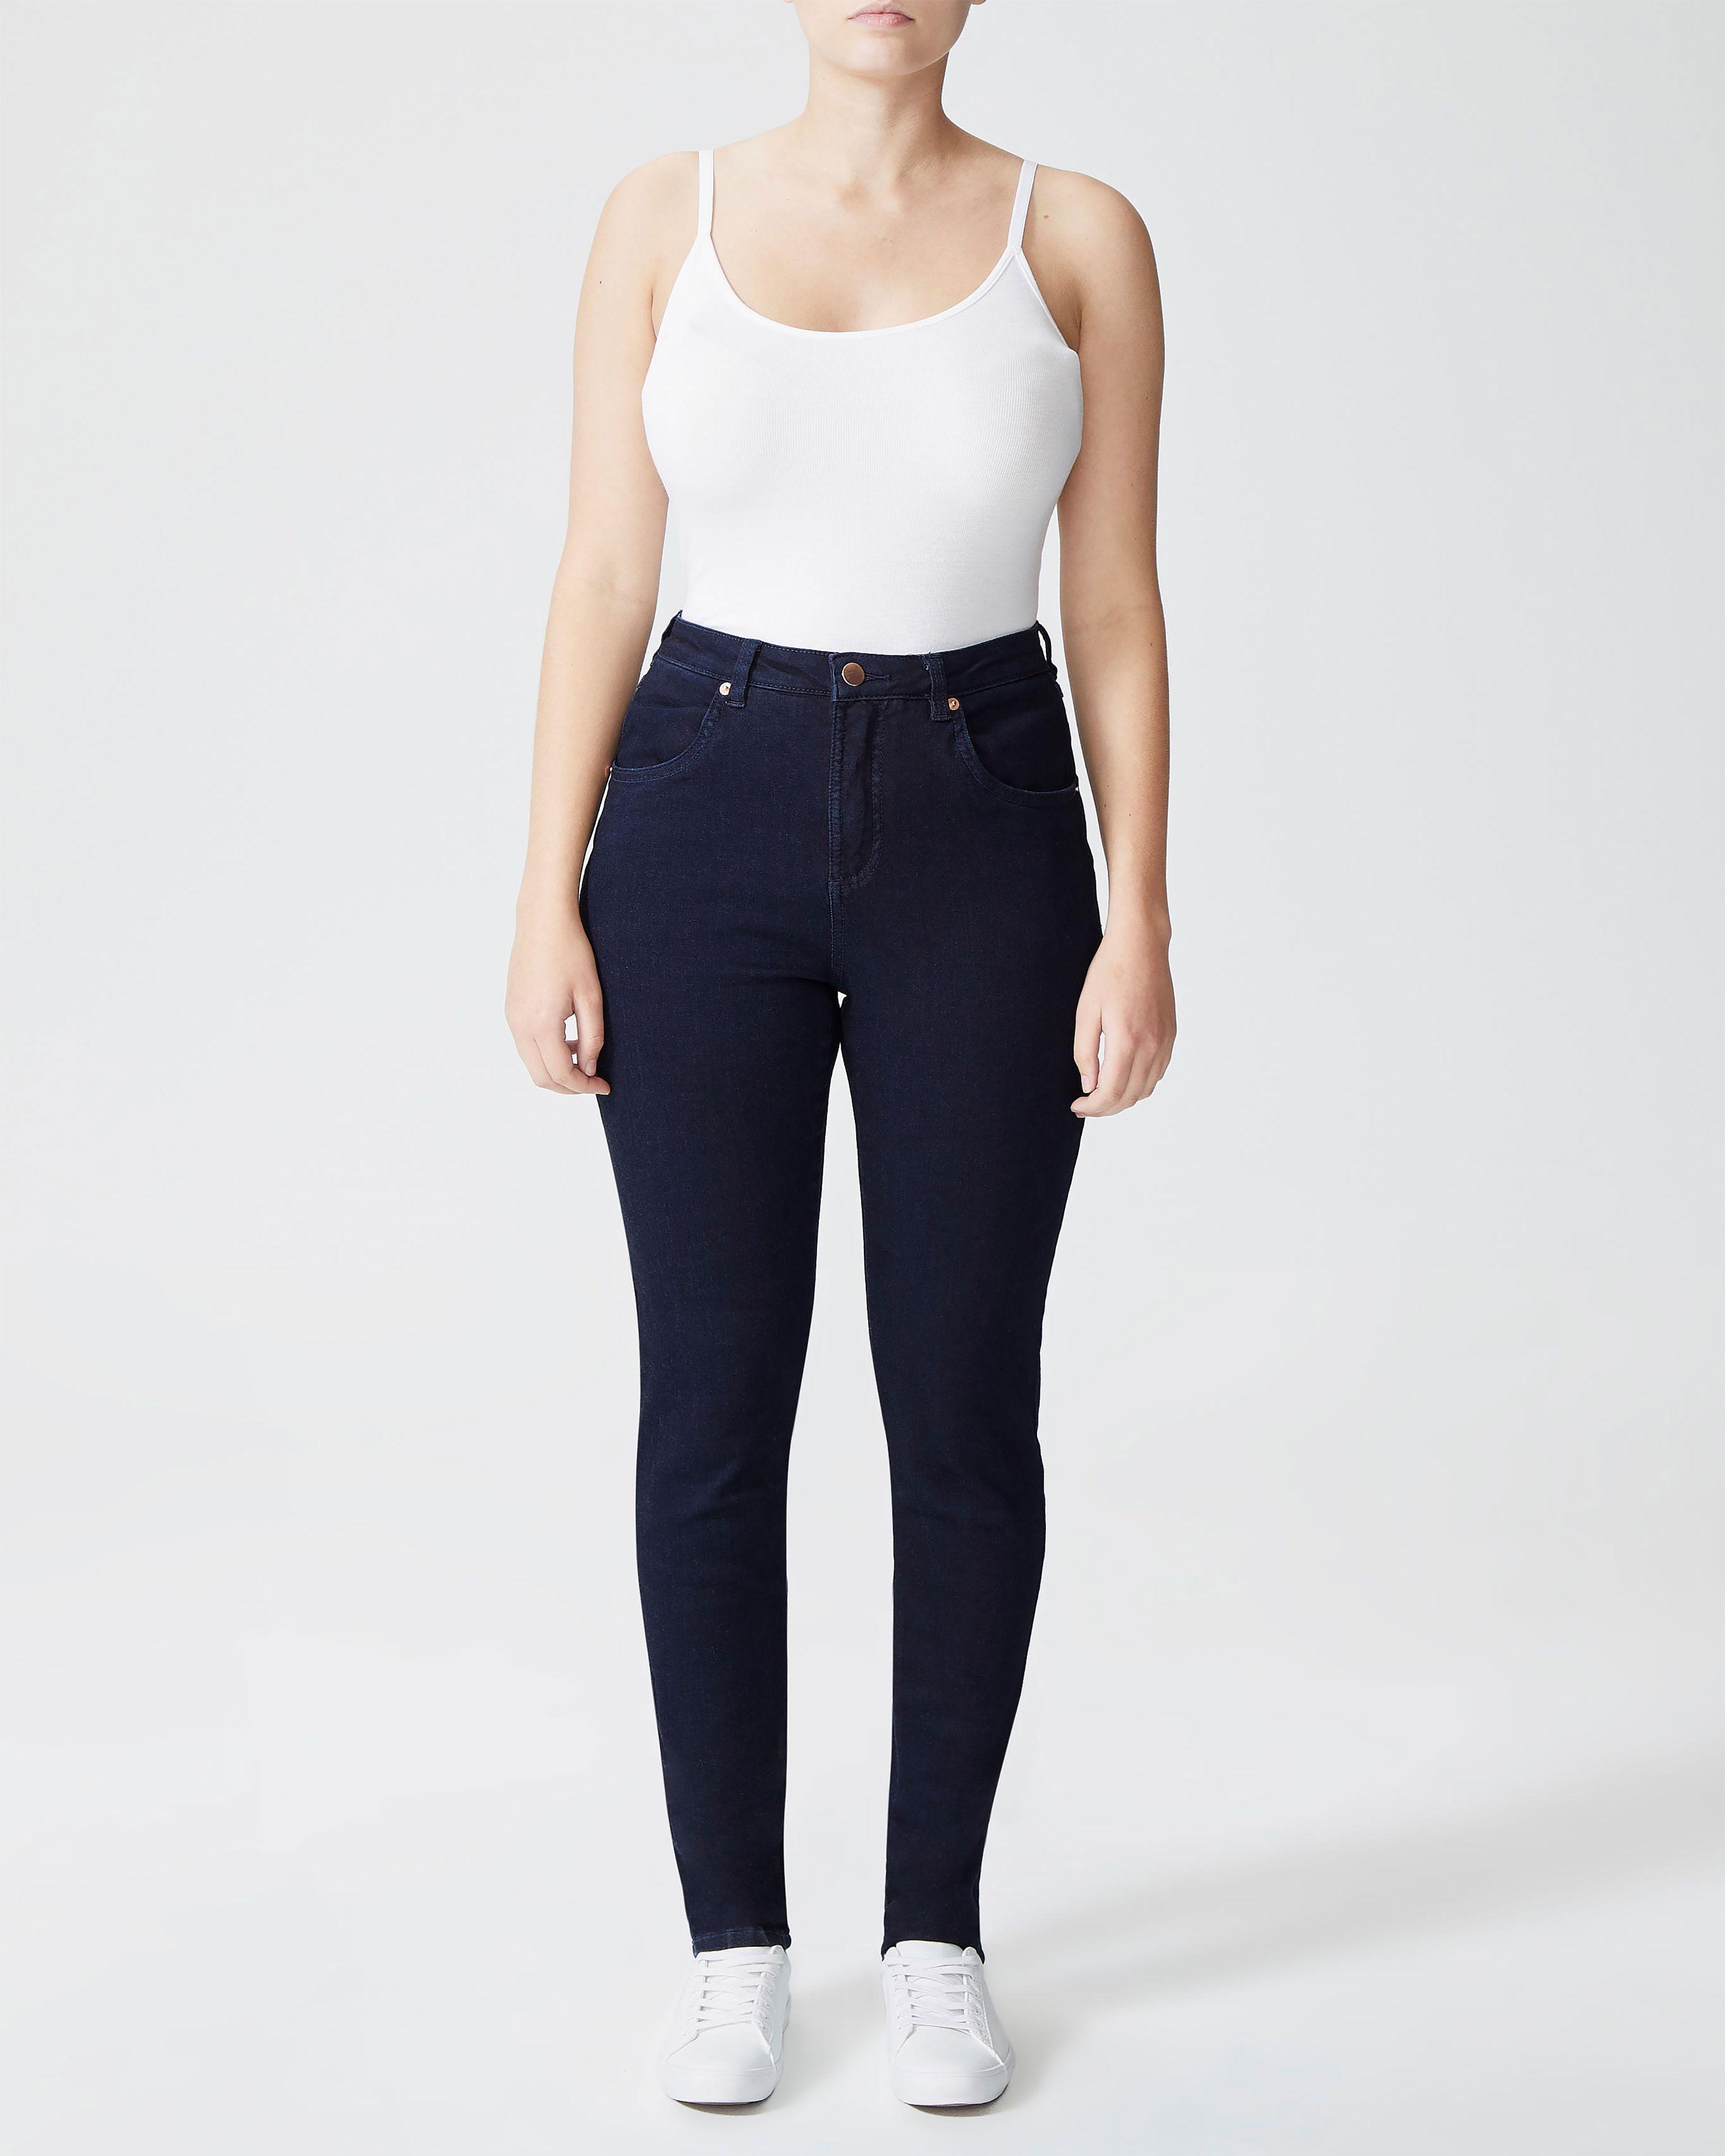 Seine High Rise Skinny Jeans Petite - Dark Indigo